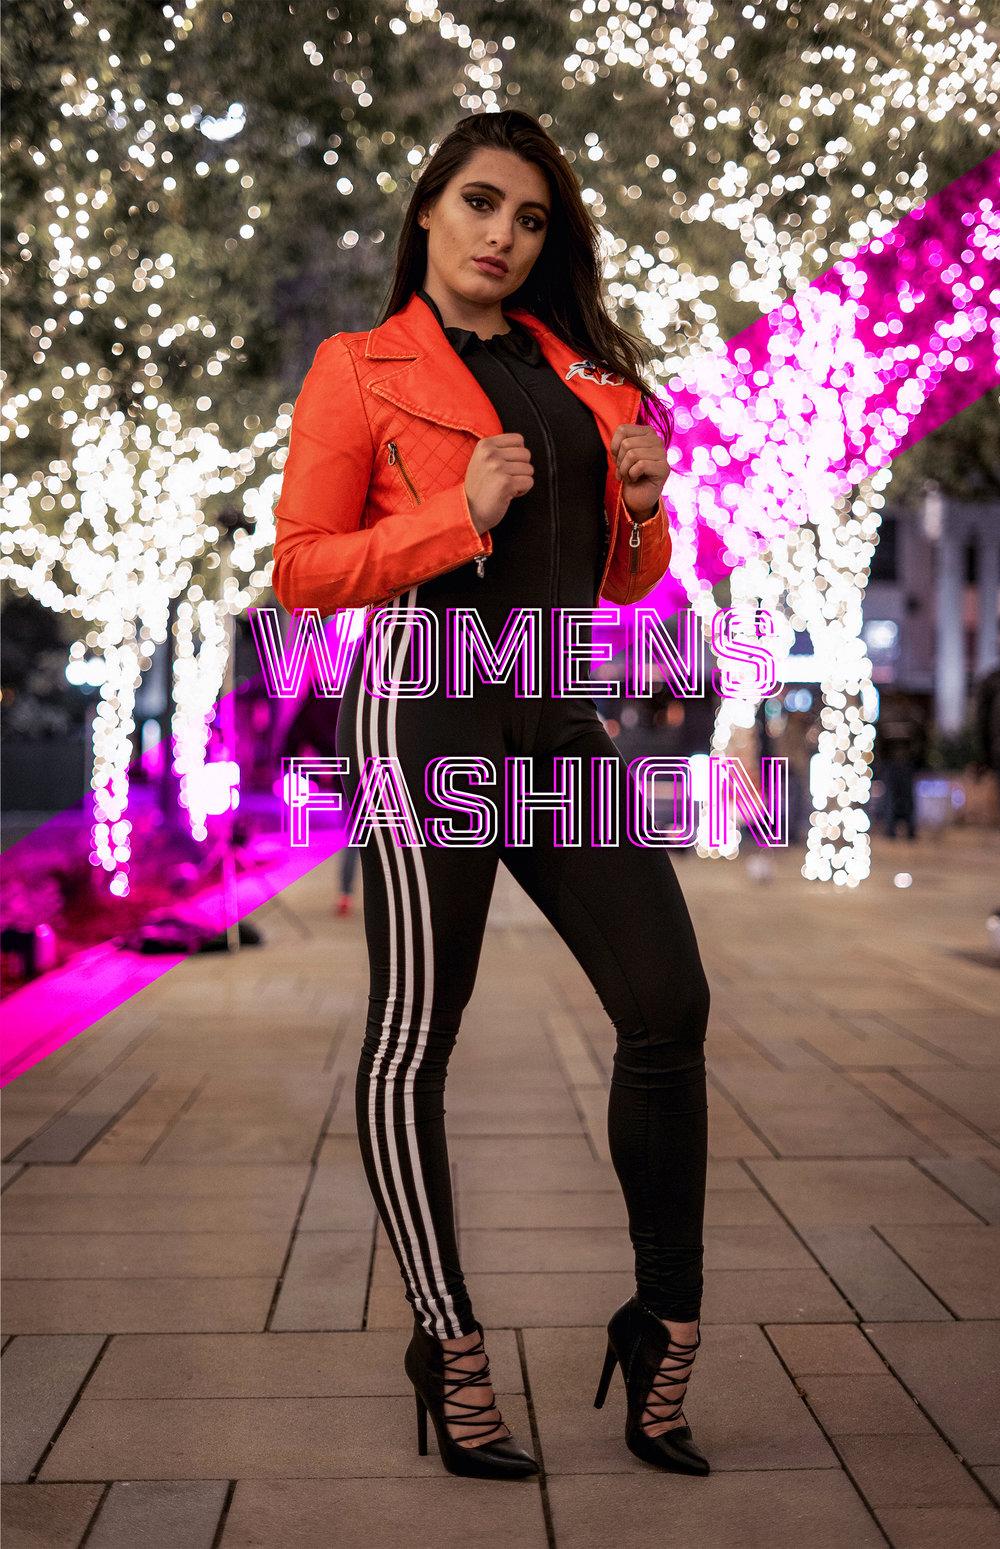 Women's Fashion Thumb@0,75x.jpg